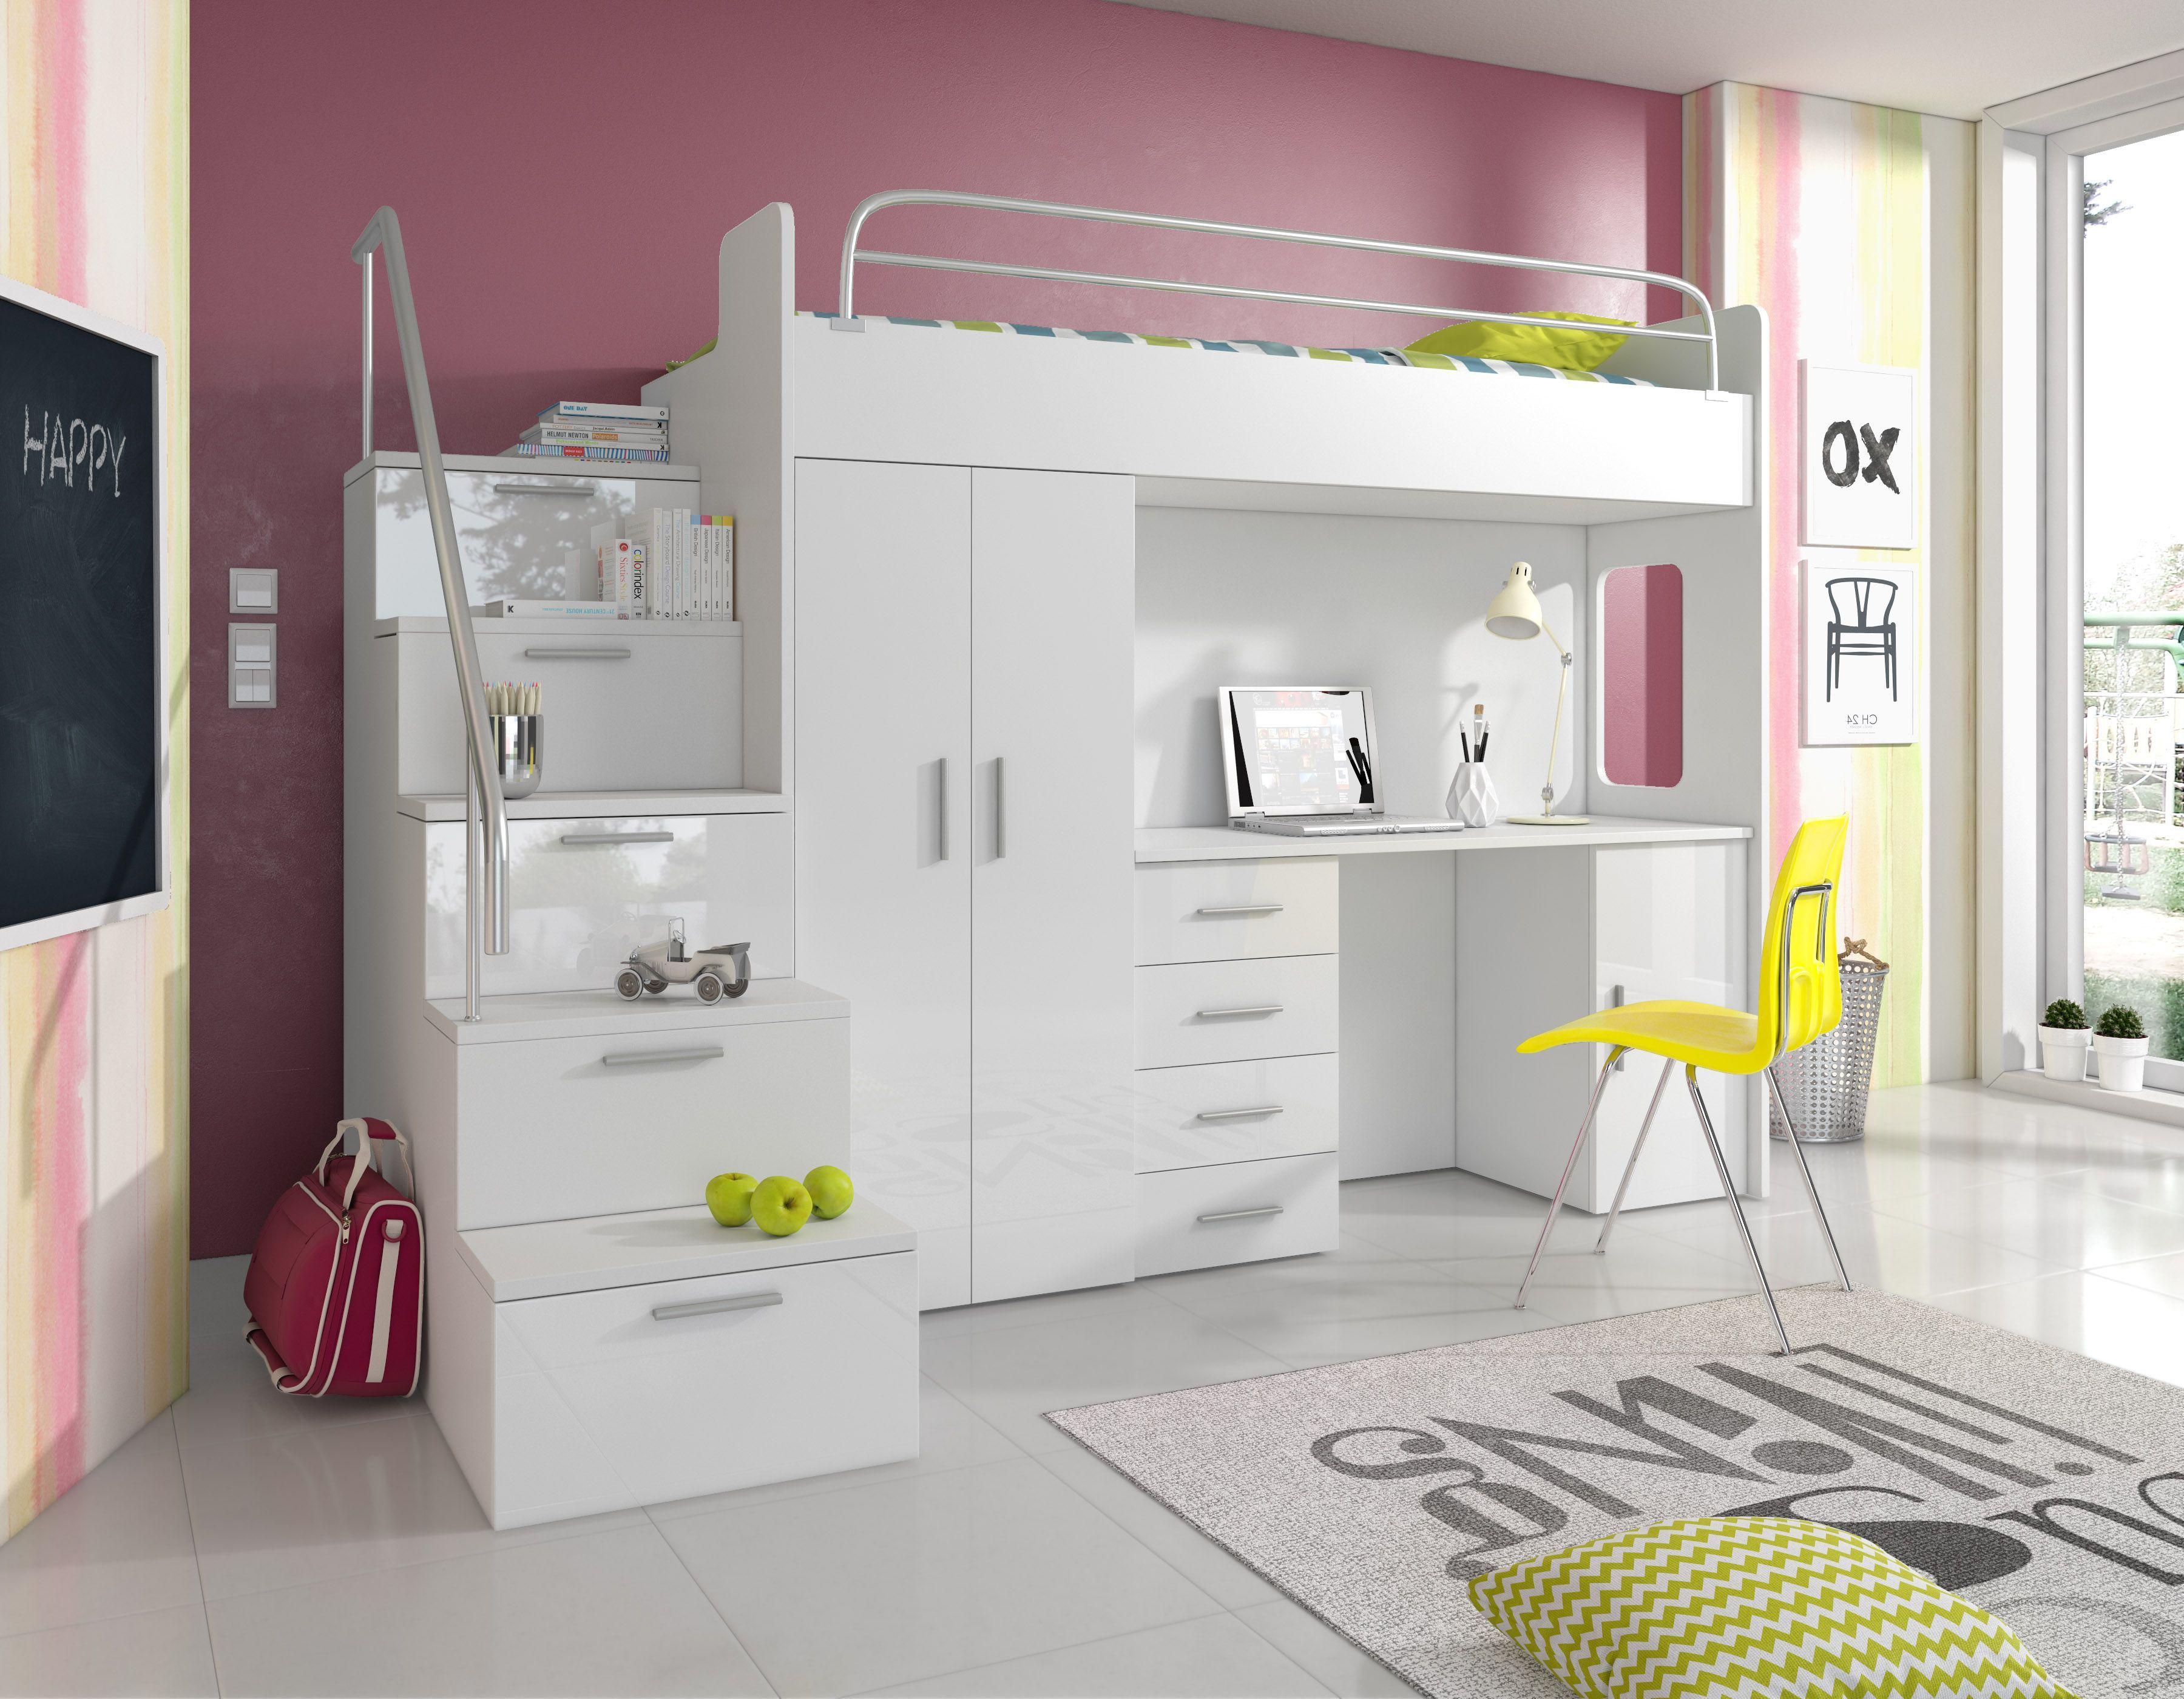 Paradise Hochbett 4s Weiss 80x200 Cm Loft Betten Hochbett Mit Schrank Etagenbett Schreibtisch